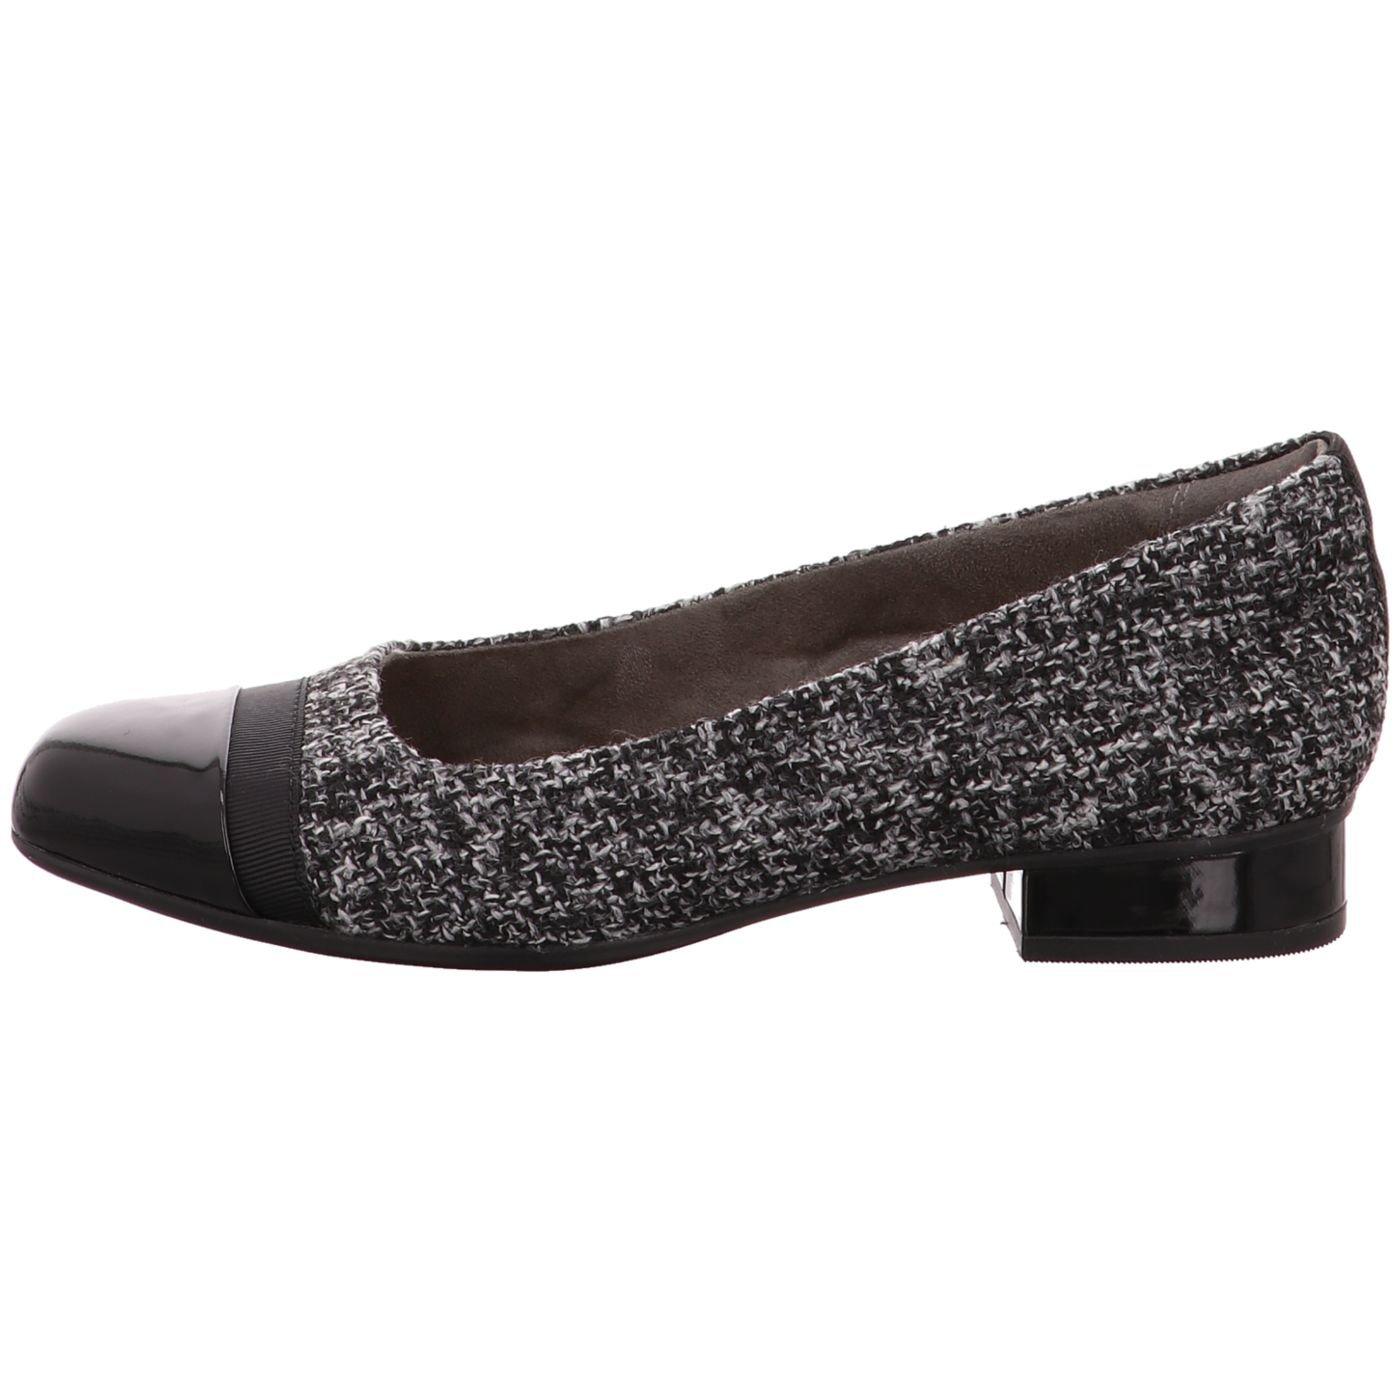 Clarks Schuhe Originals GLICK DARBY aubergine  Echtleder Damen Halbschuhe NEU